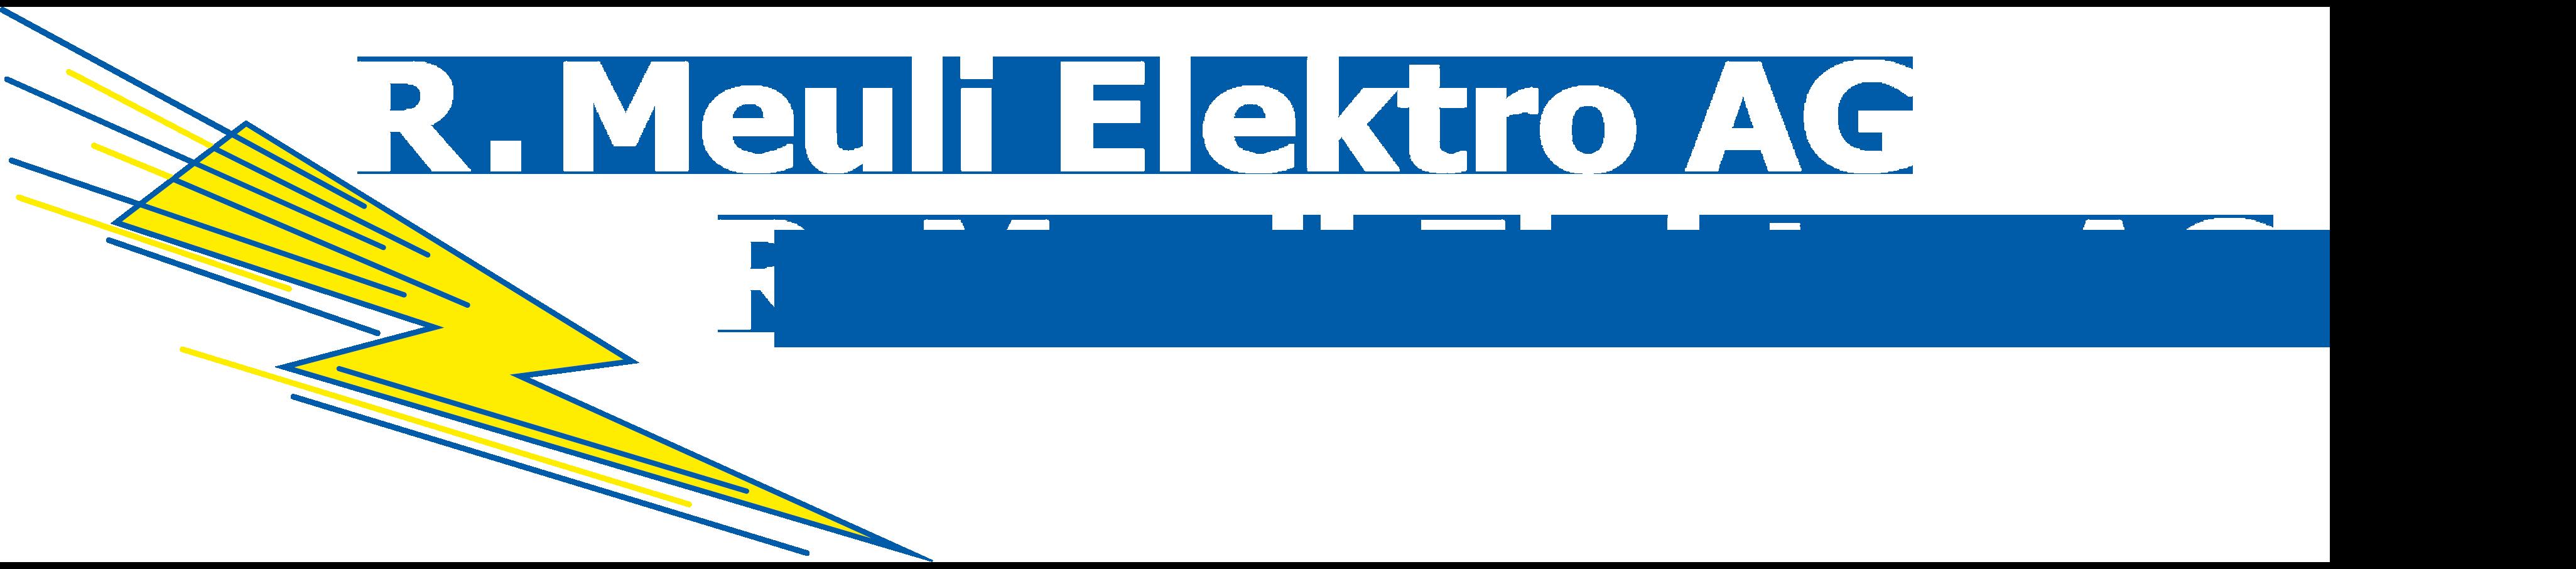 R. Meuli Elektro AG